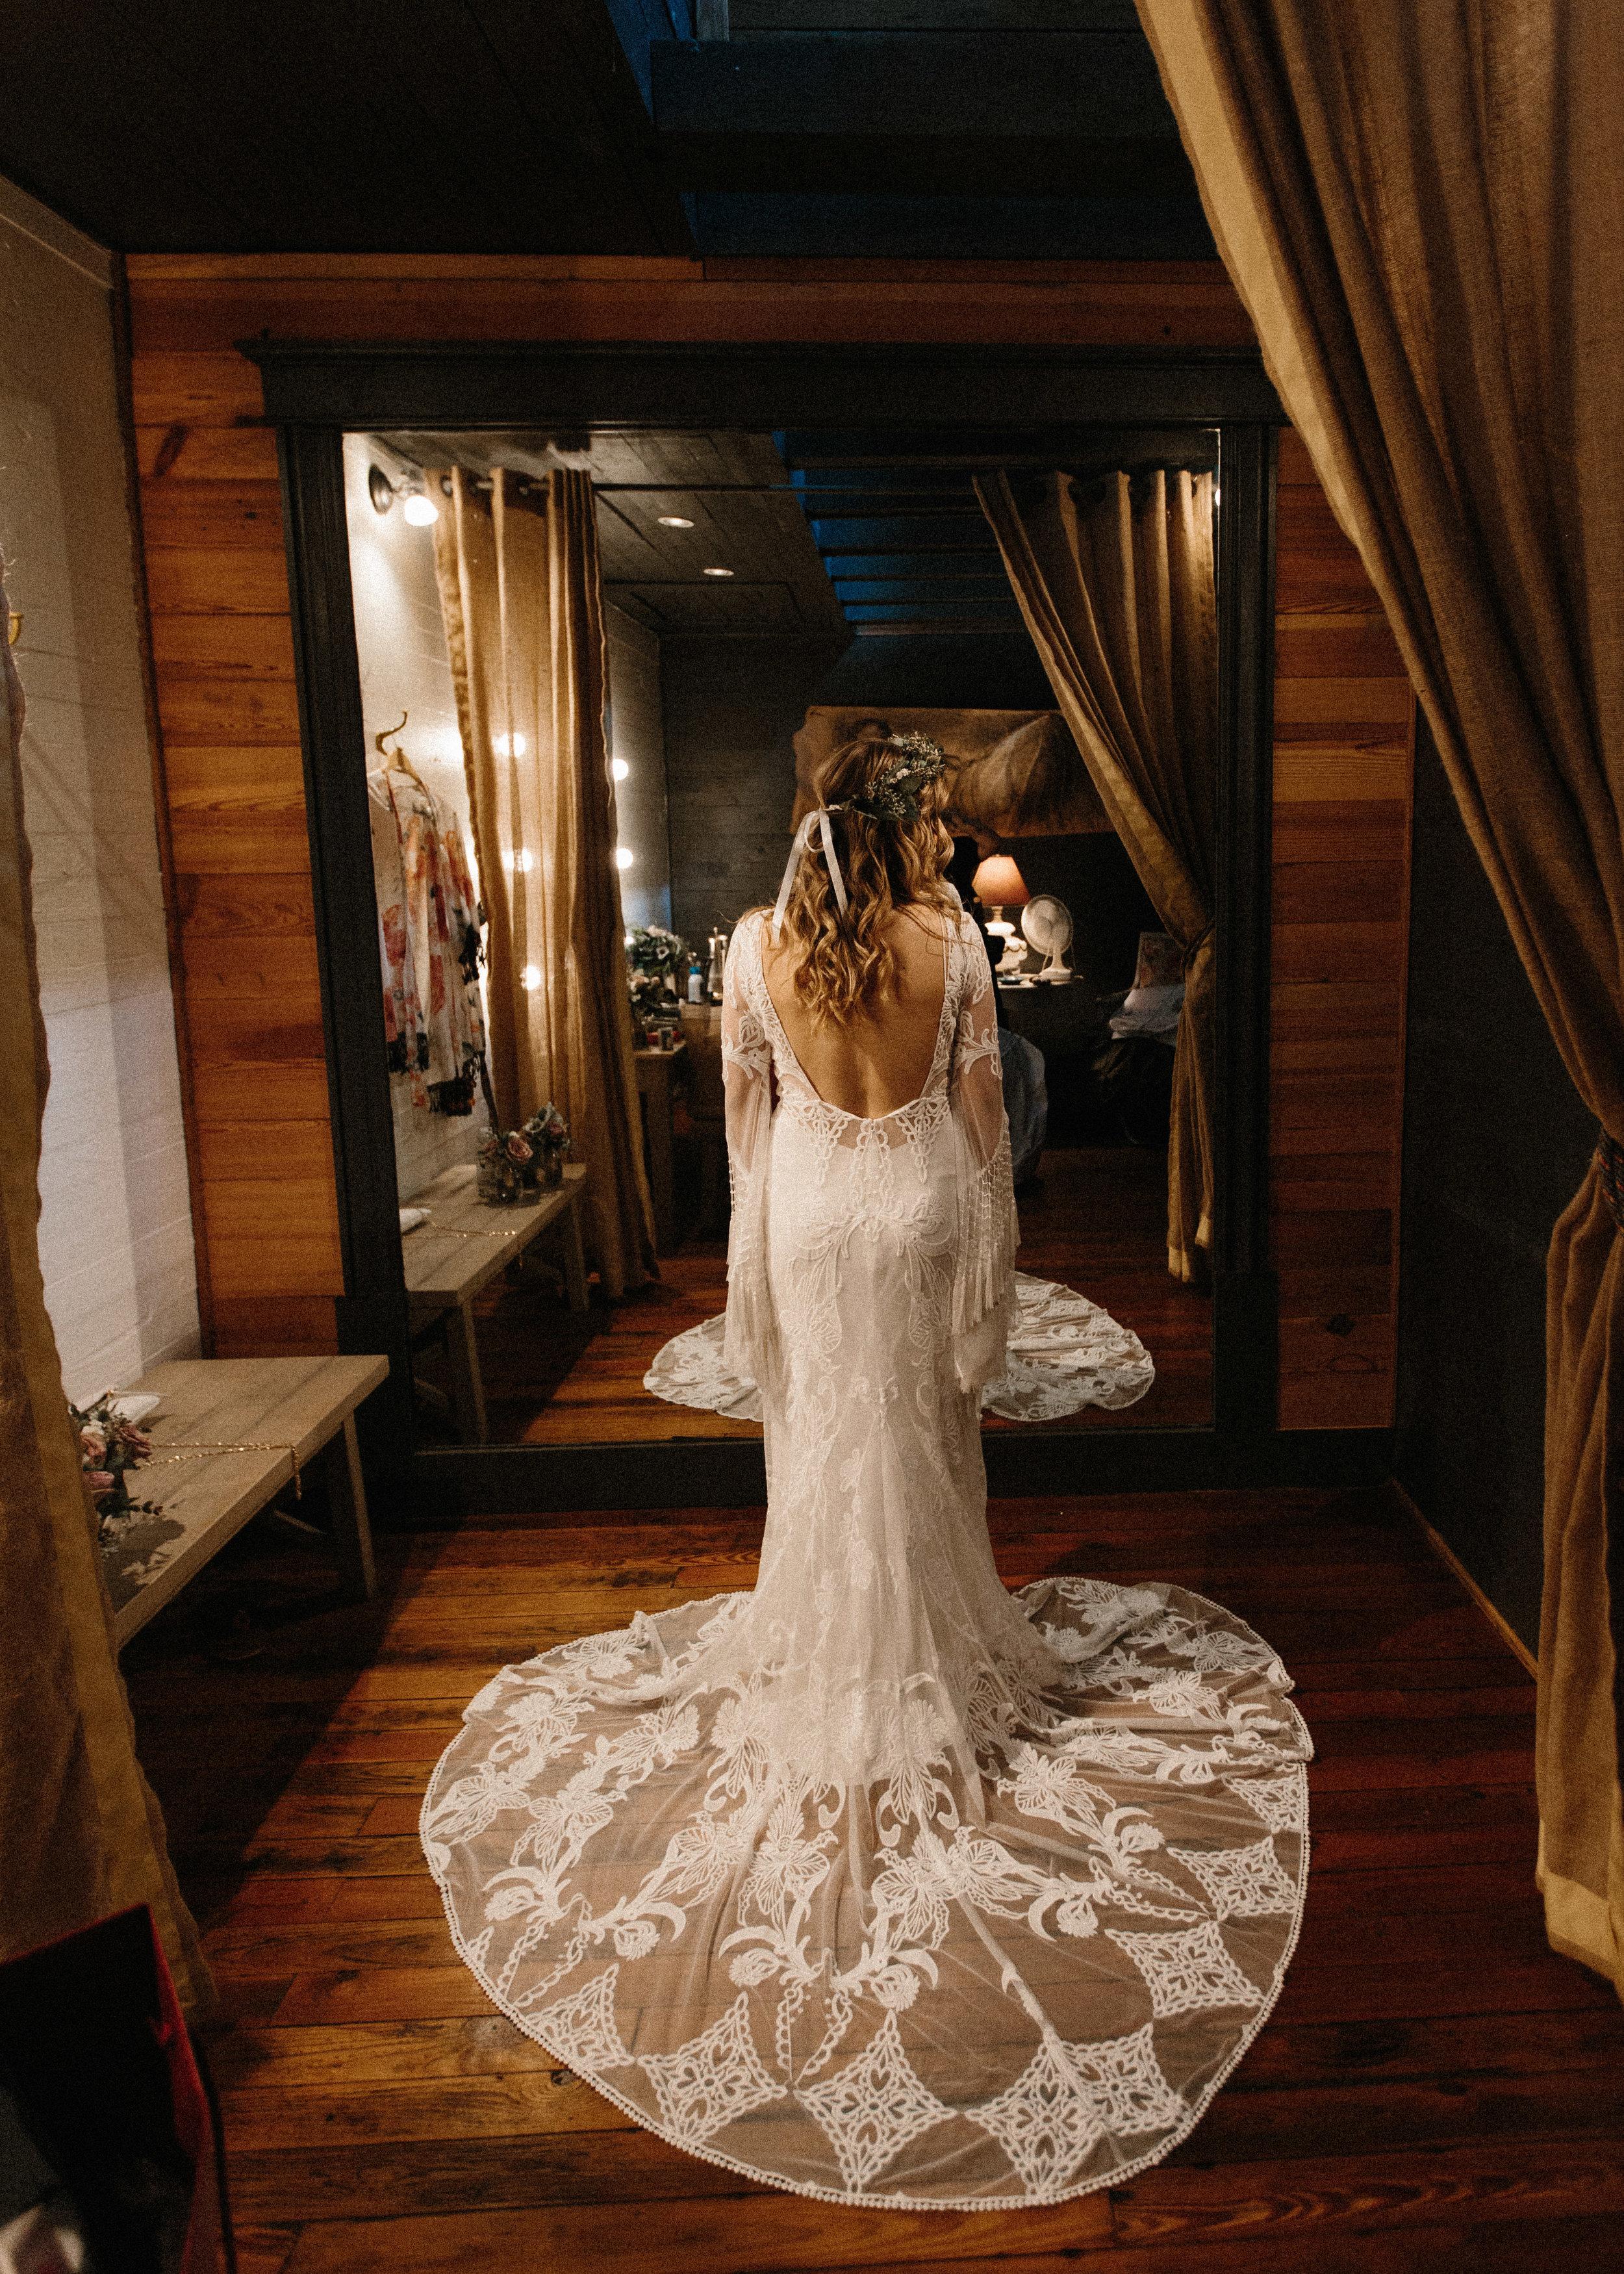 cherry_hollow_farms_industrial_unique_venue_georgia_serenbe_wedding_boho_midsummer_nights_dream_river_west_1206.jpg